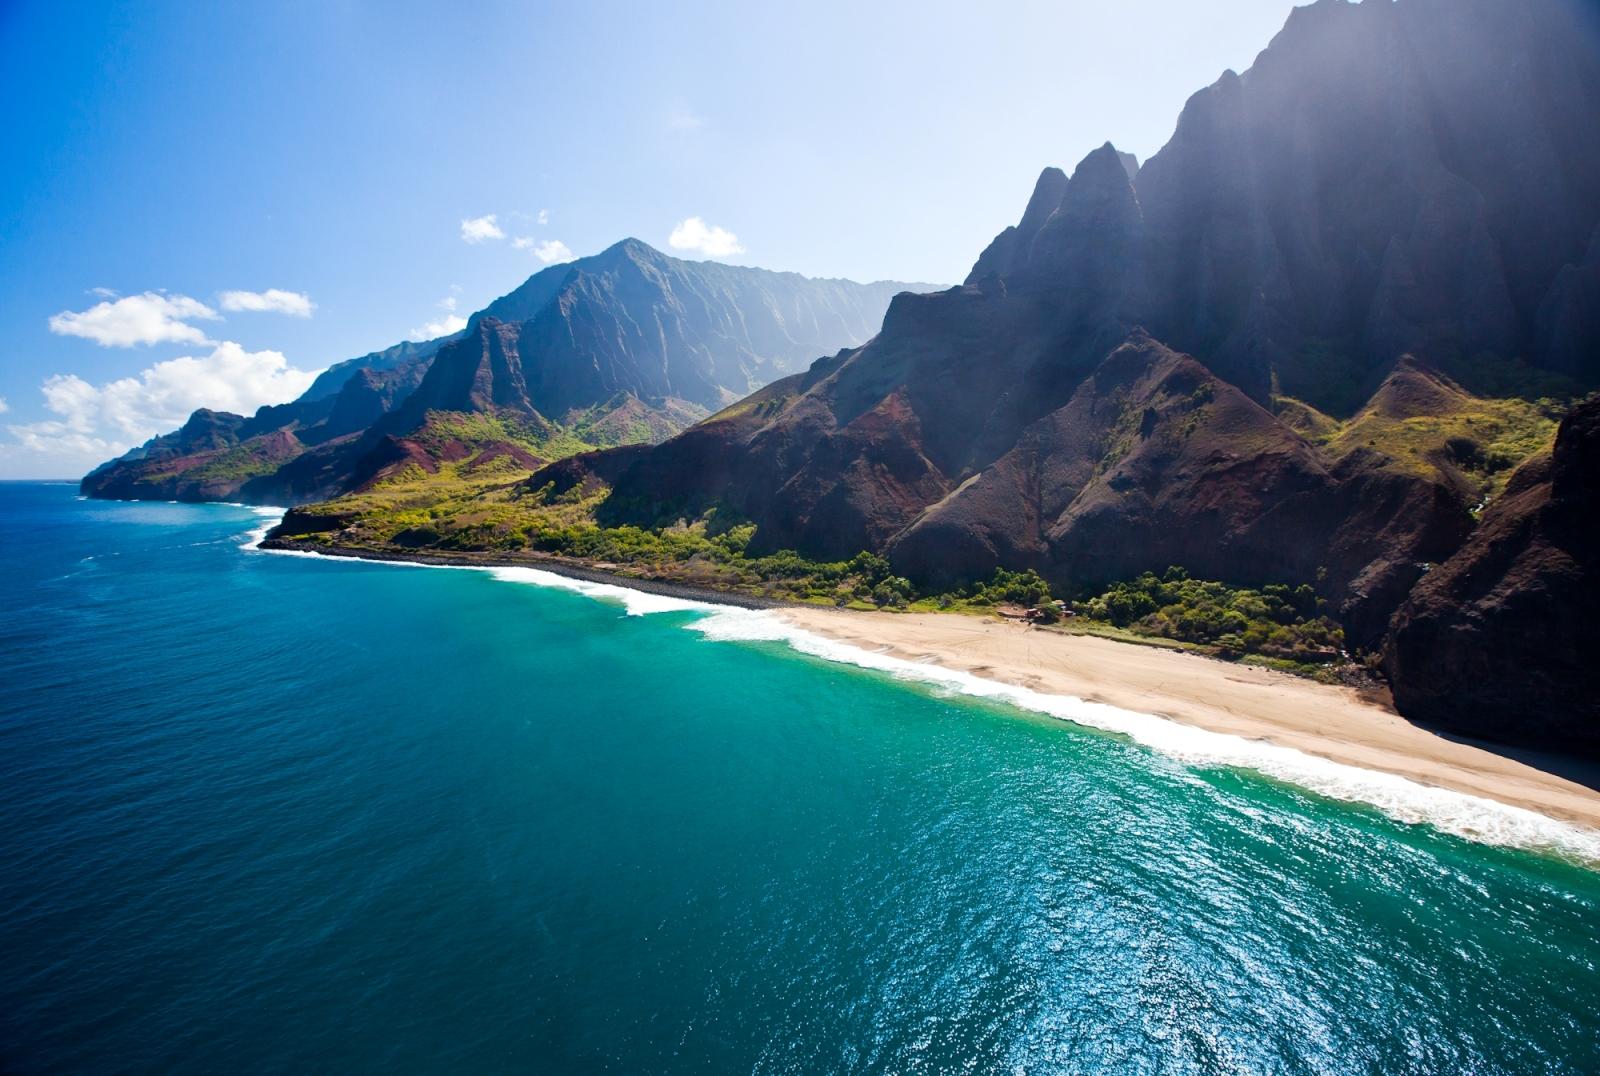 Hawaii Tourism Authority (HTA) / Tor Johnson